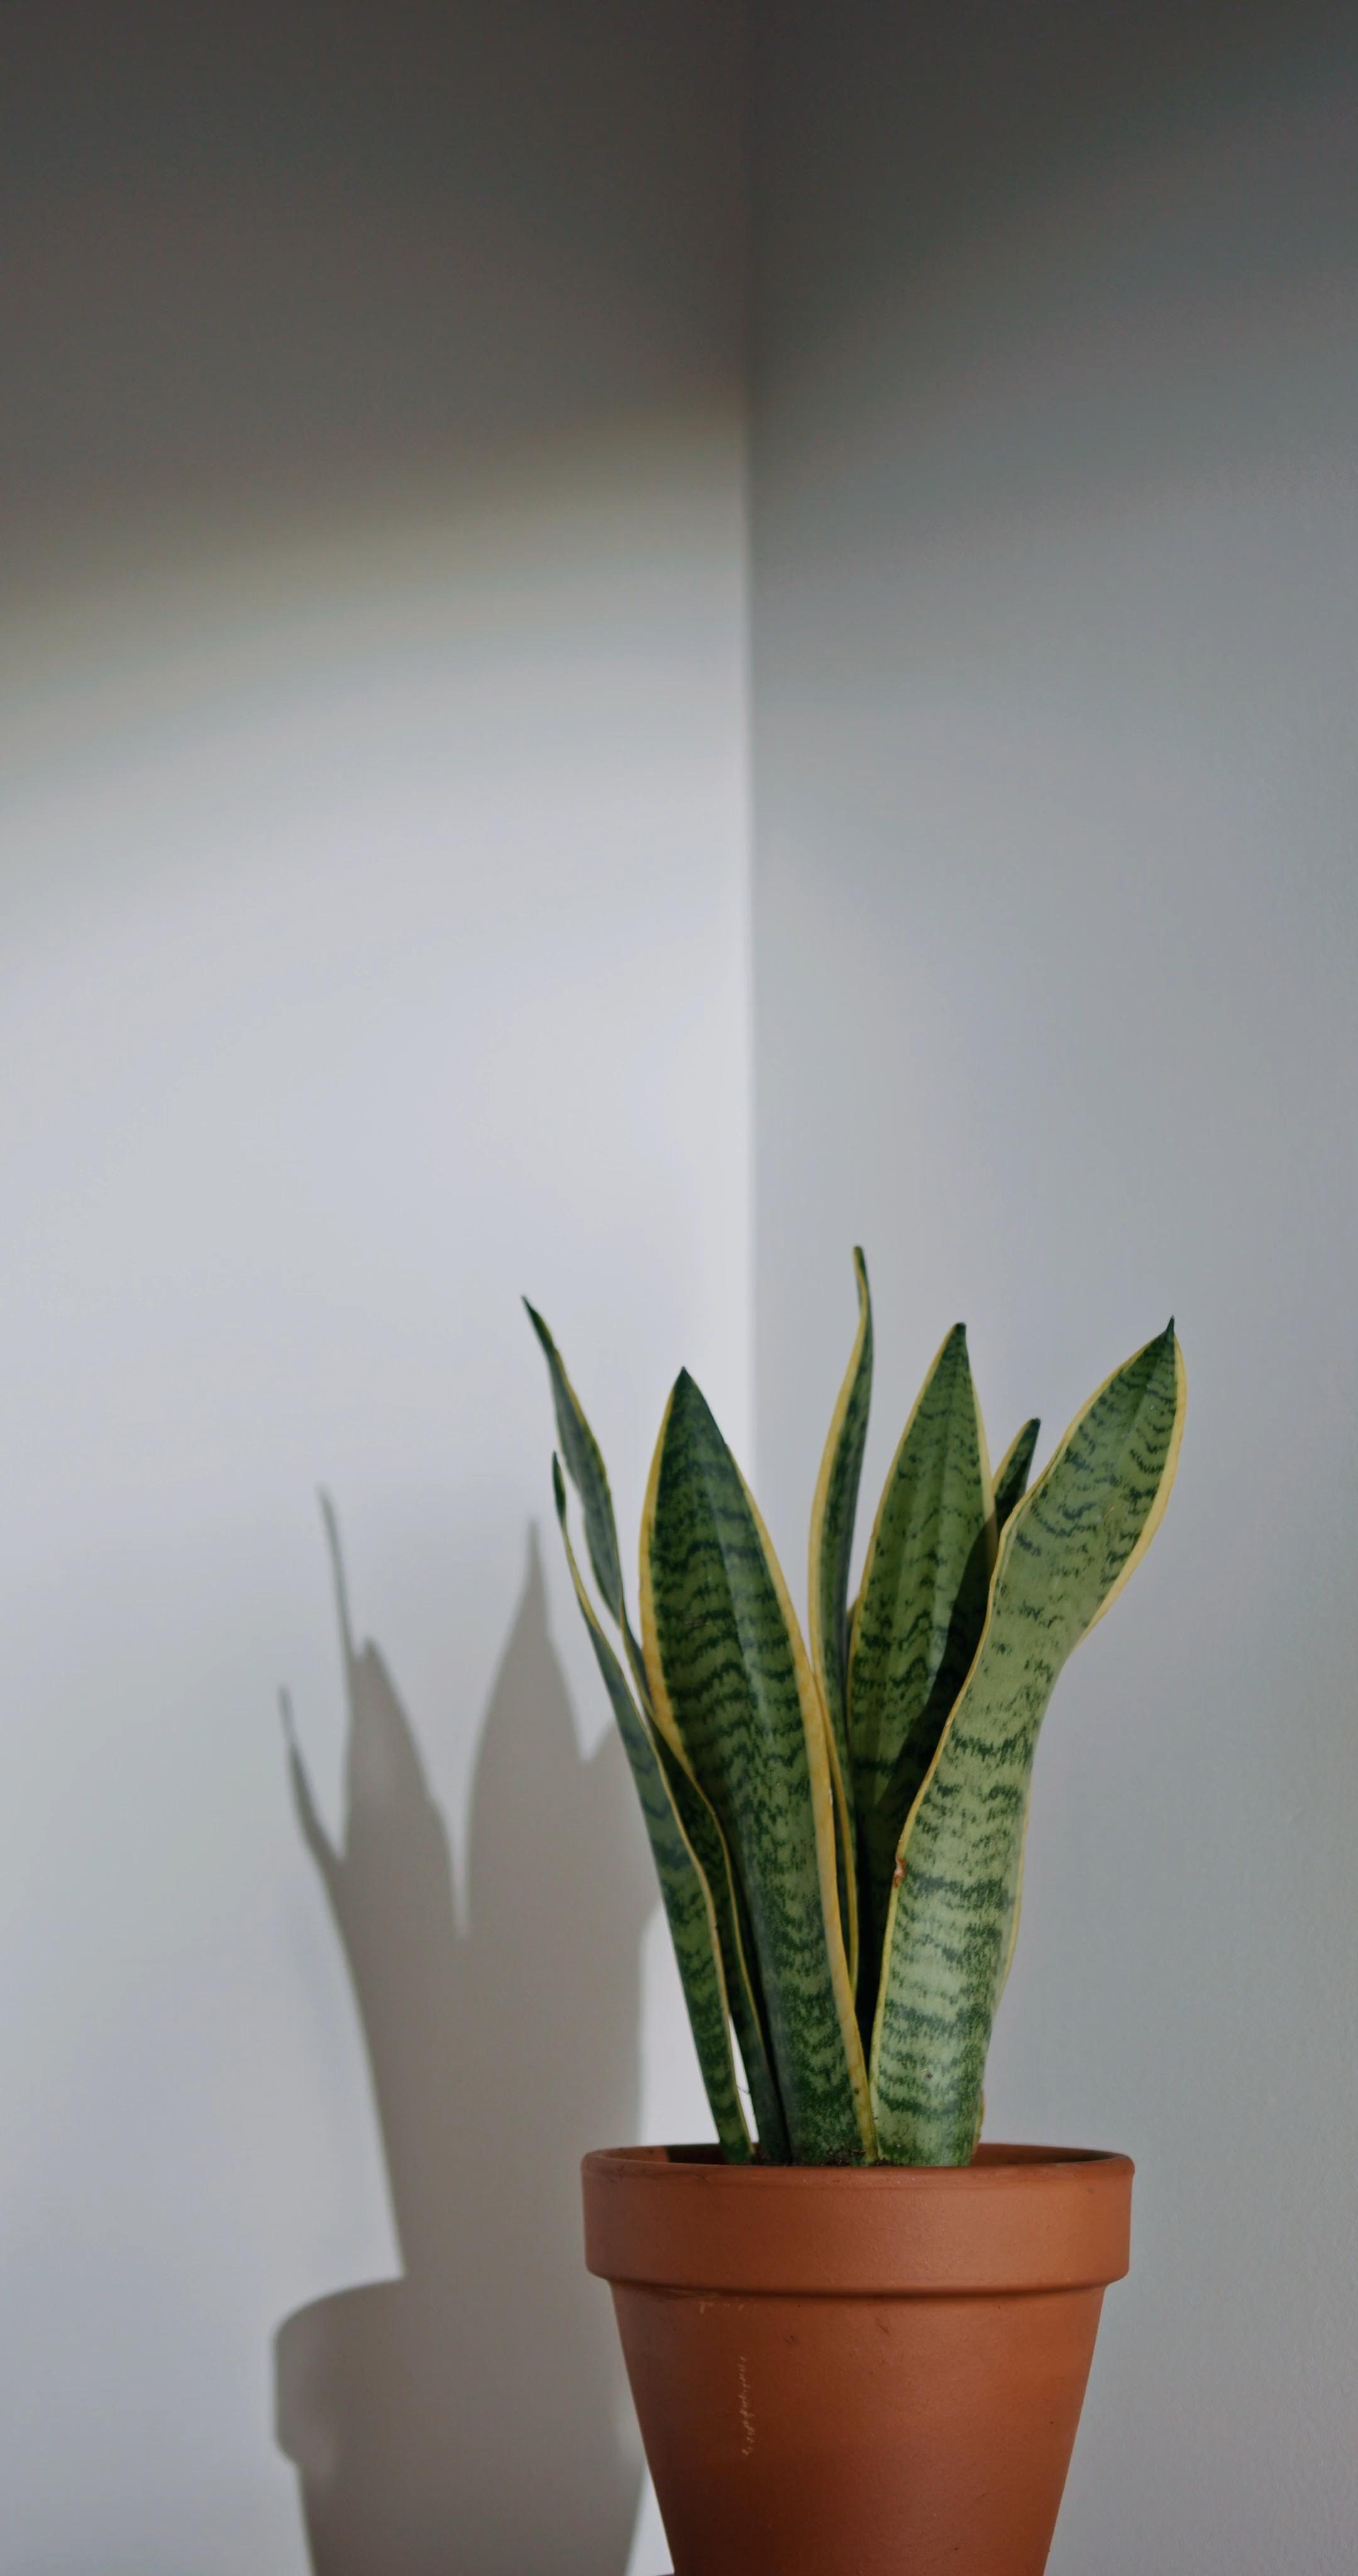 Video Rustic Laser Studio Affordable Way To Personalize Your Home Or Office Wallpaper Tanaman Bunga Kering Tanaman Hijau